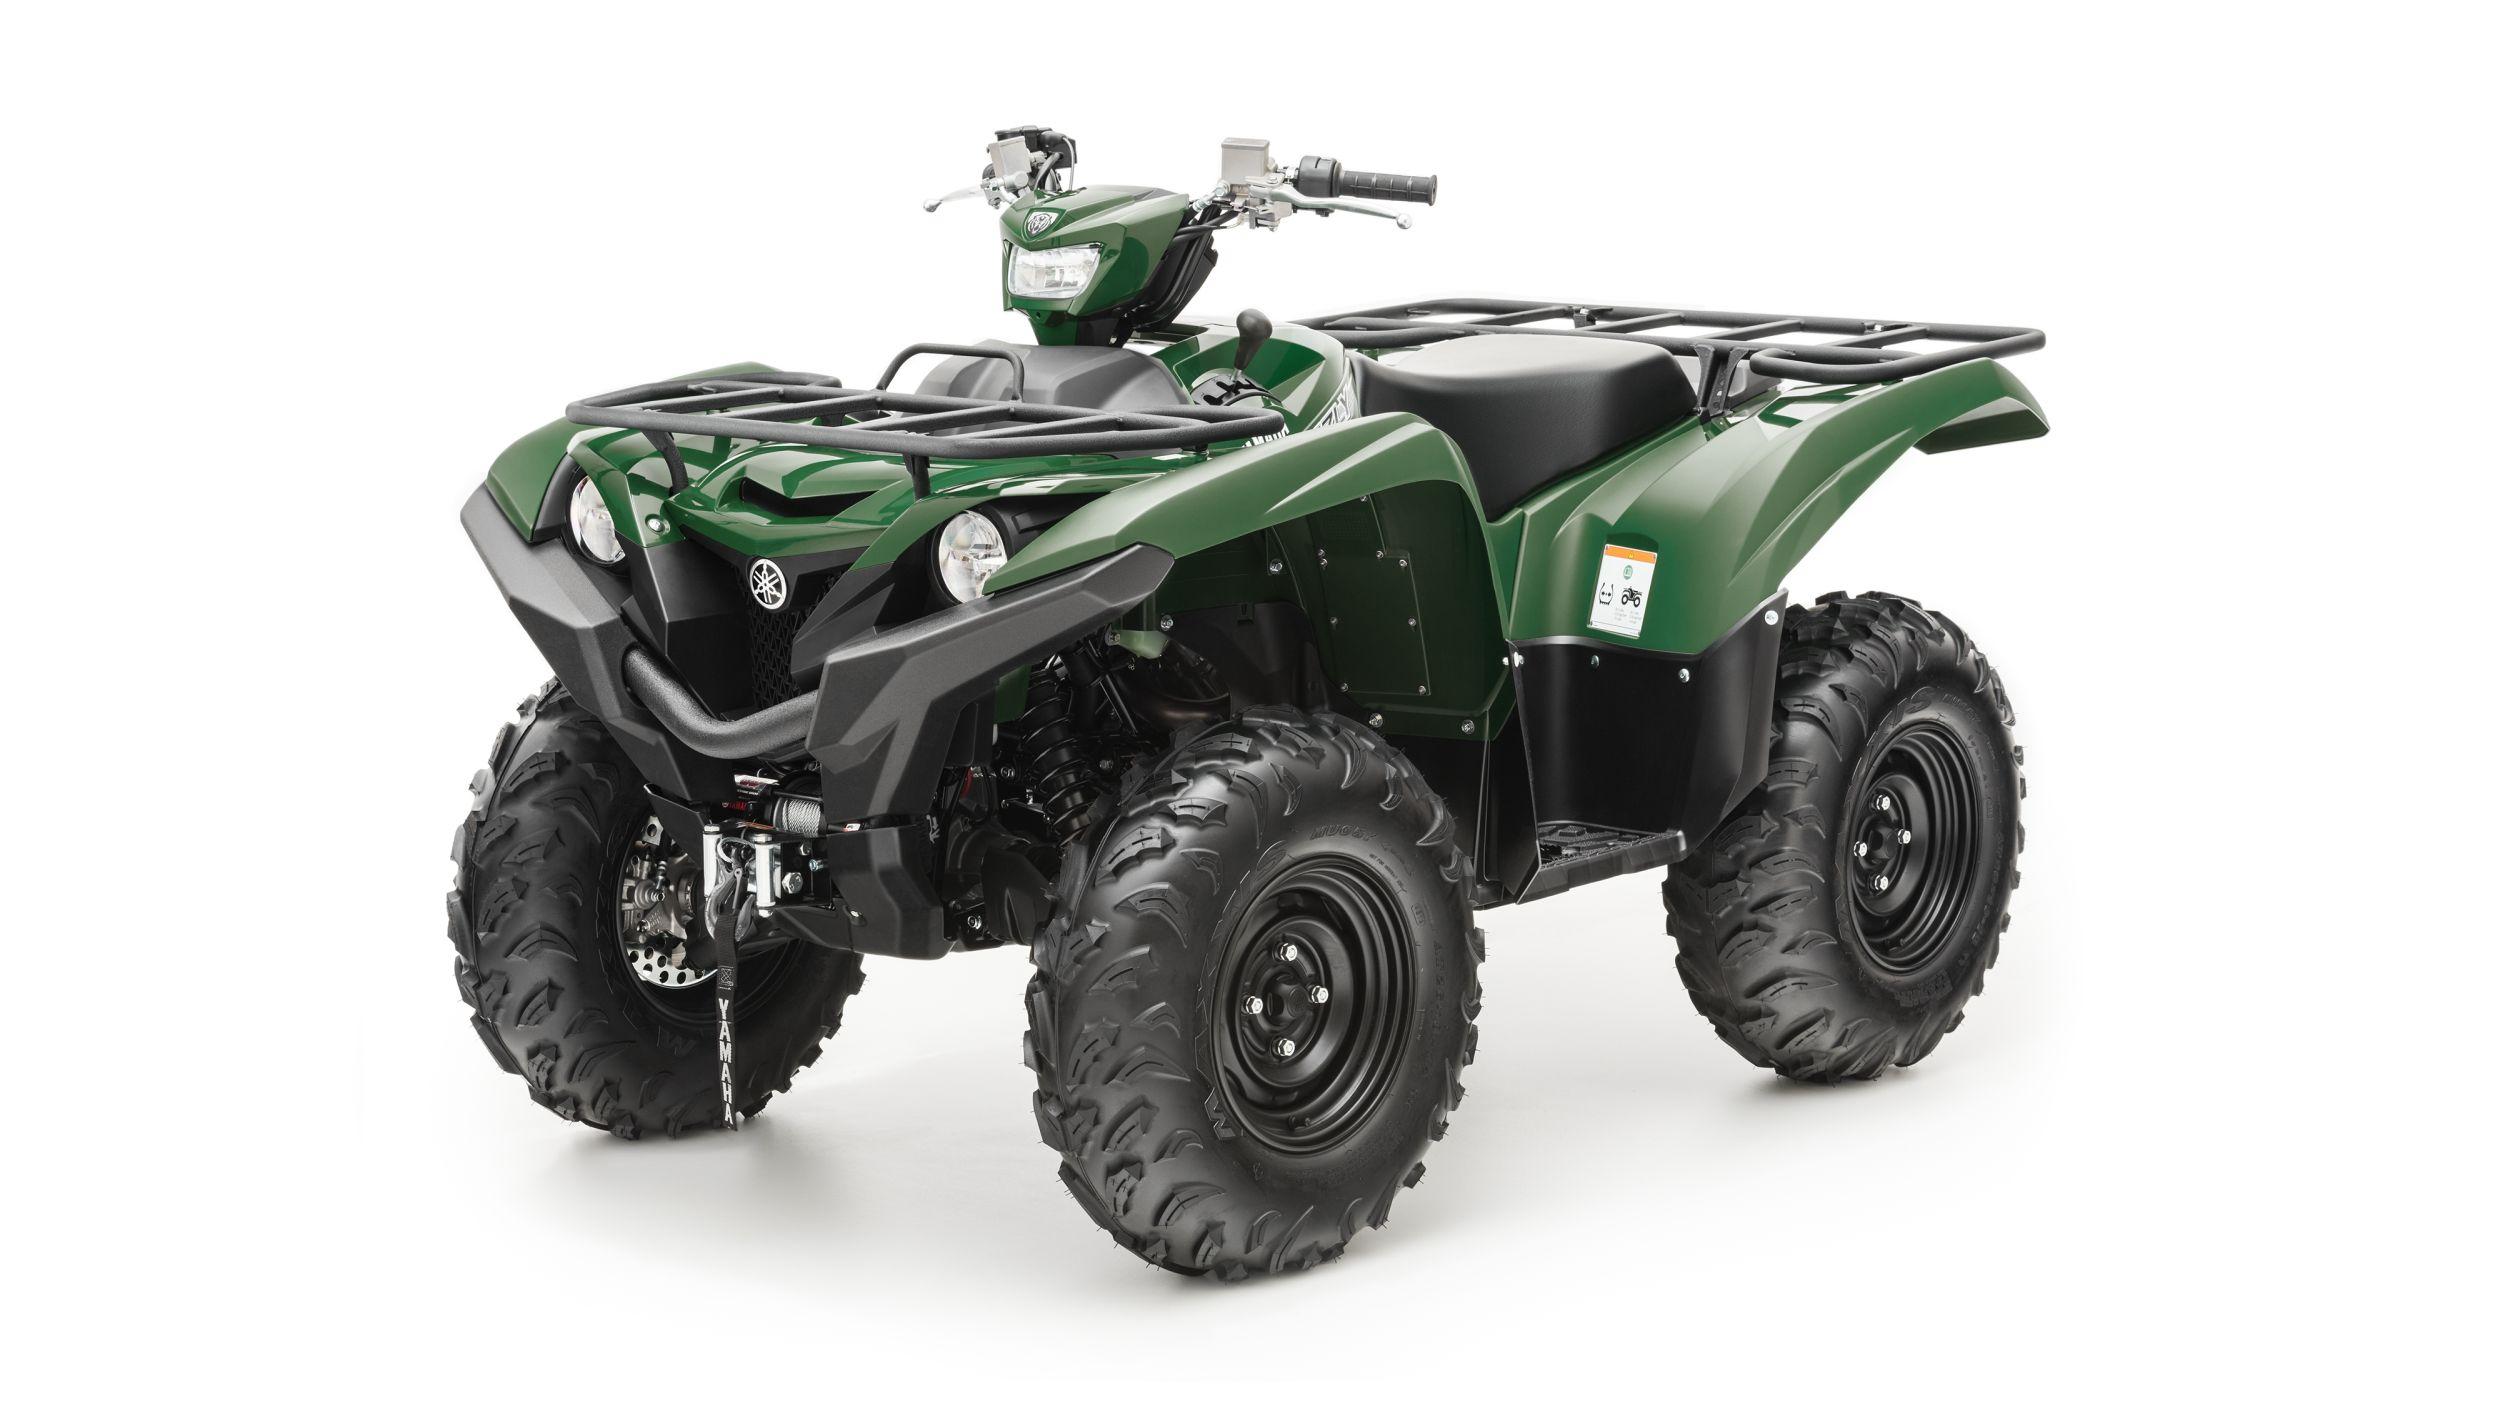 Yamaha Kodiak Vs Grizzly